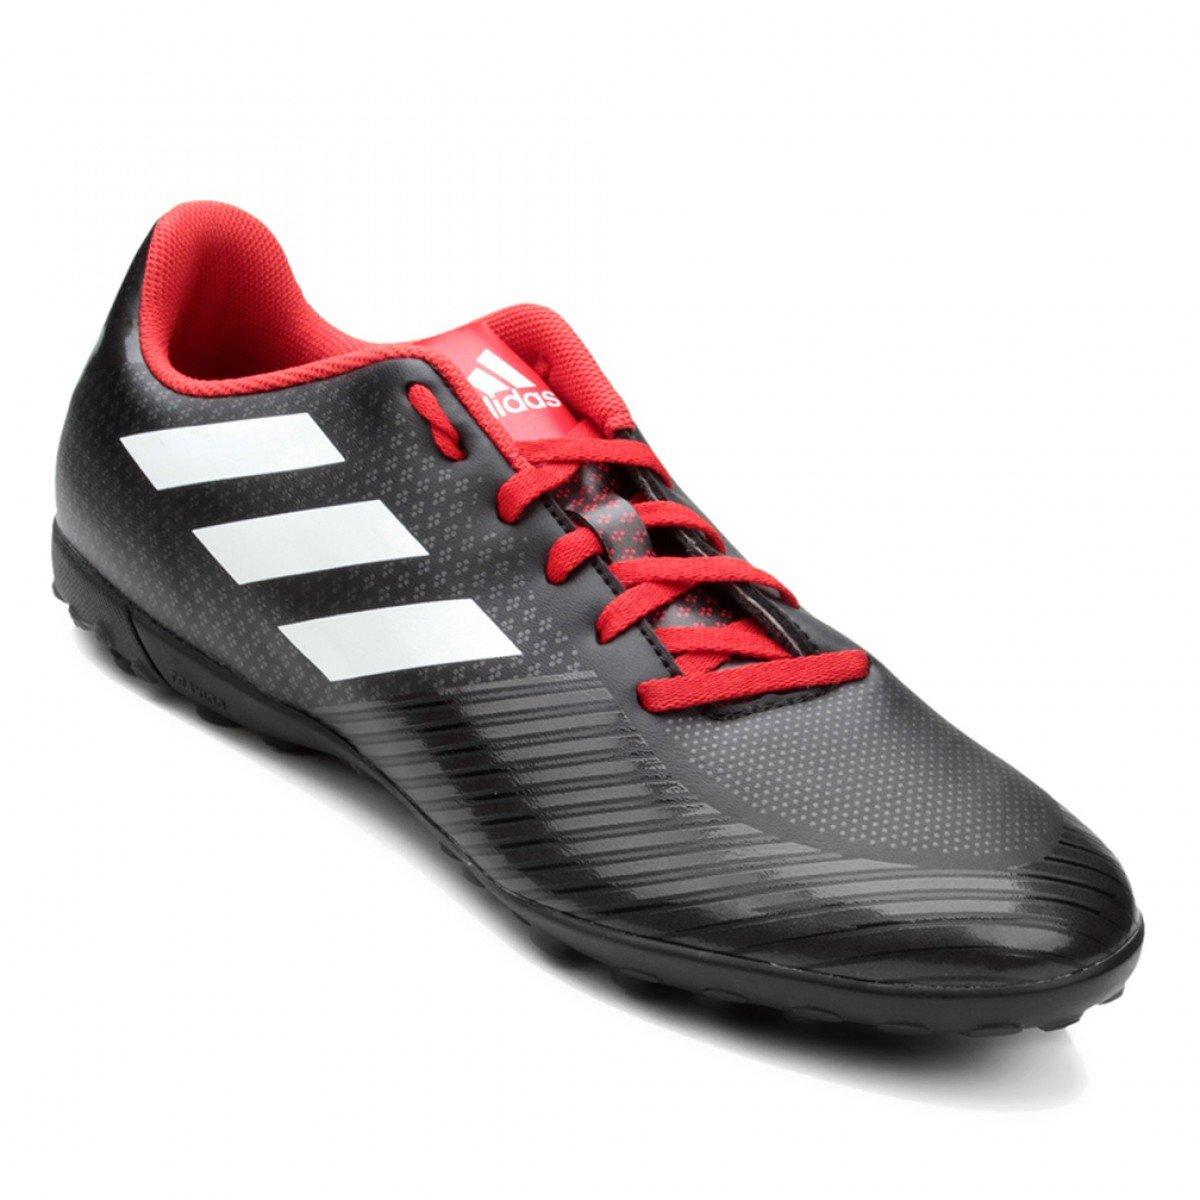 Chuteira Society Adidas Artilheira III TF Masculina - Preta e Vermelha